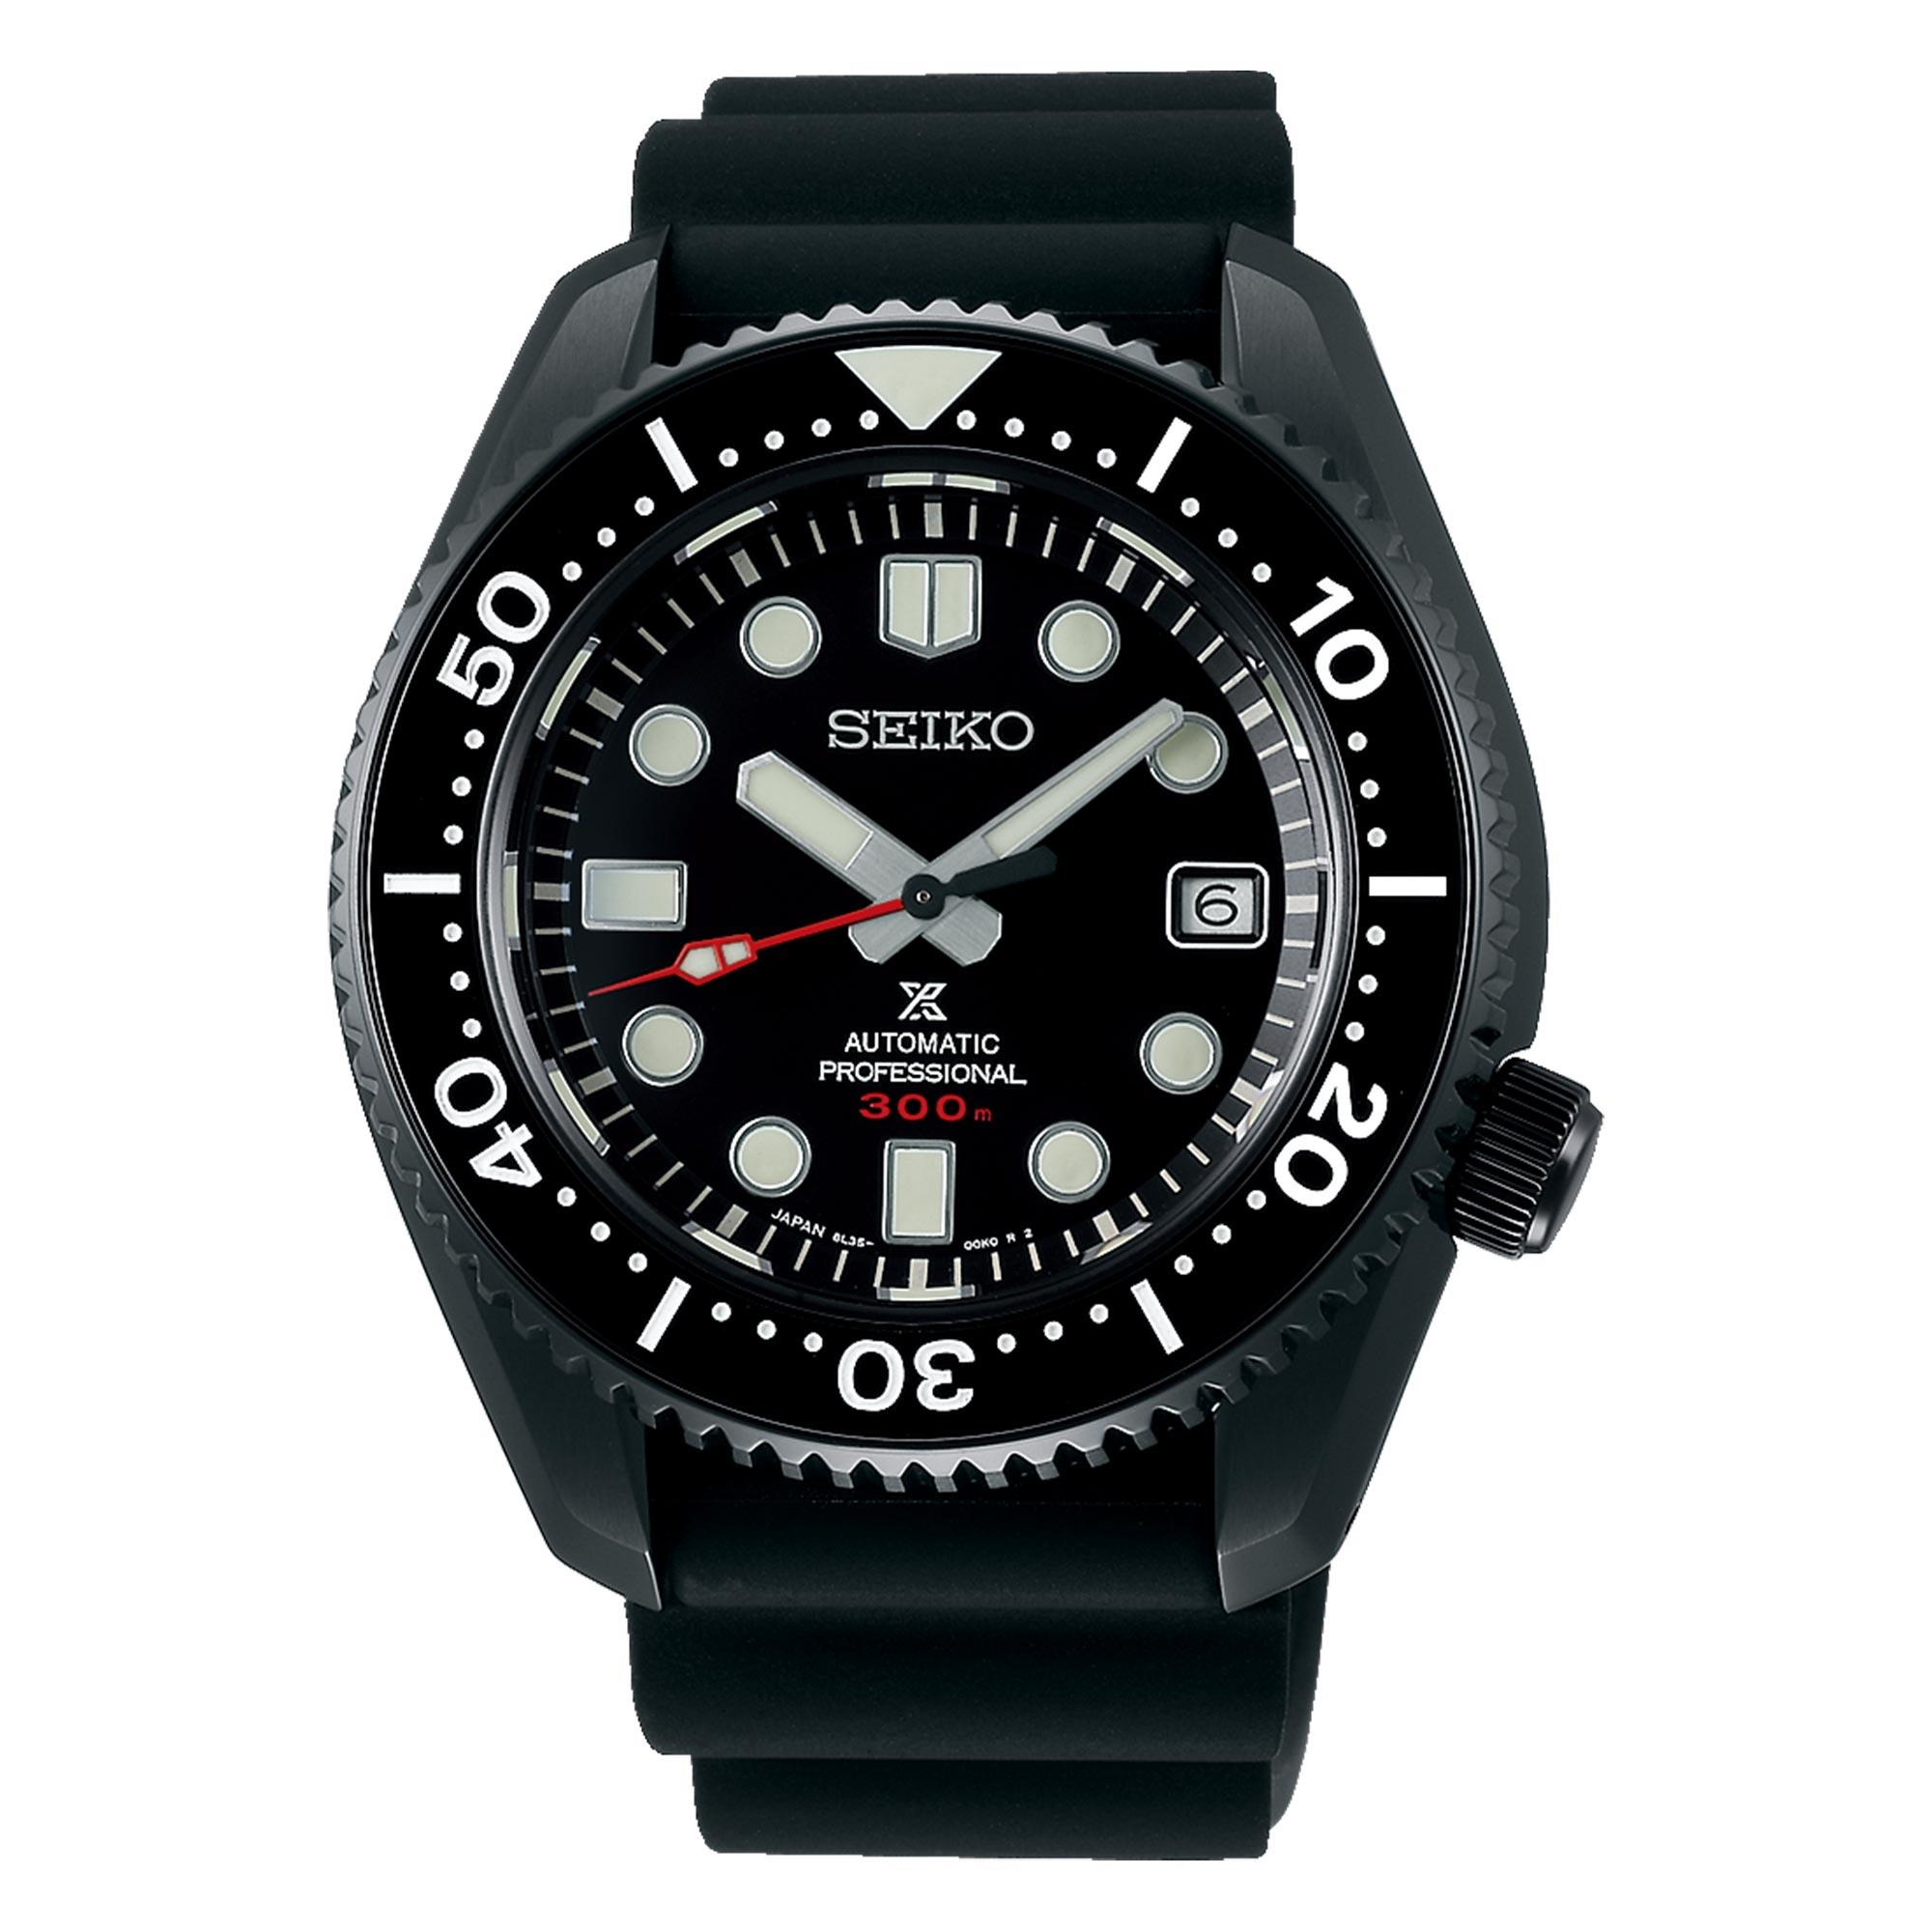 Seiko Limited Edition Diver's Prospex Black Series 'Turtle' Automatic Black Dial Silicone Strap Men's Watch SLA035J1 RRP £2,700